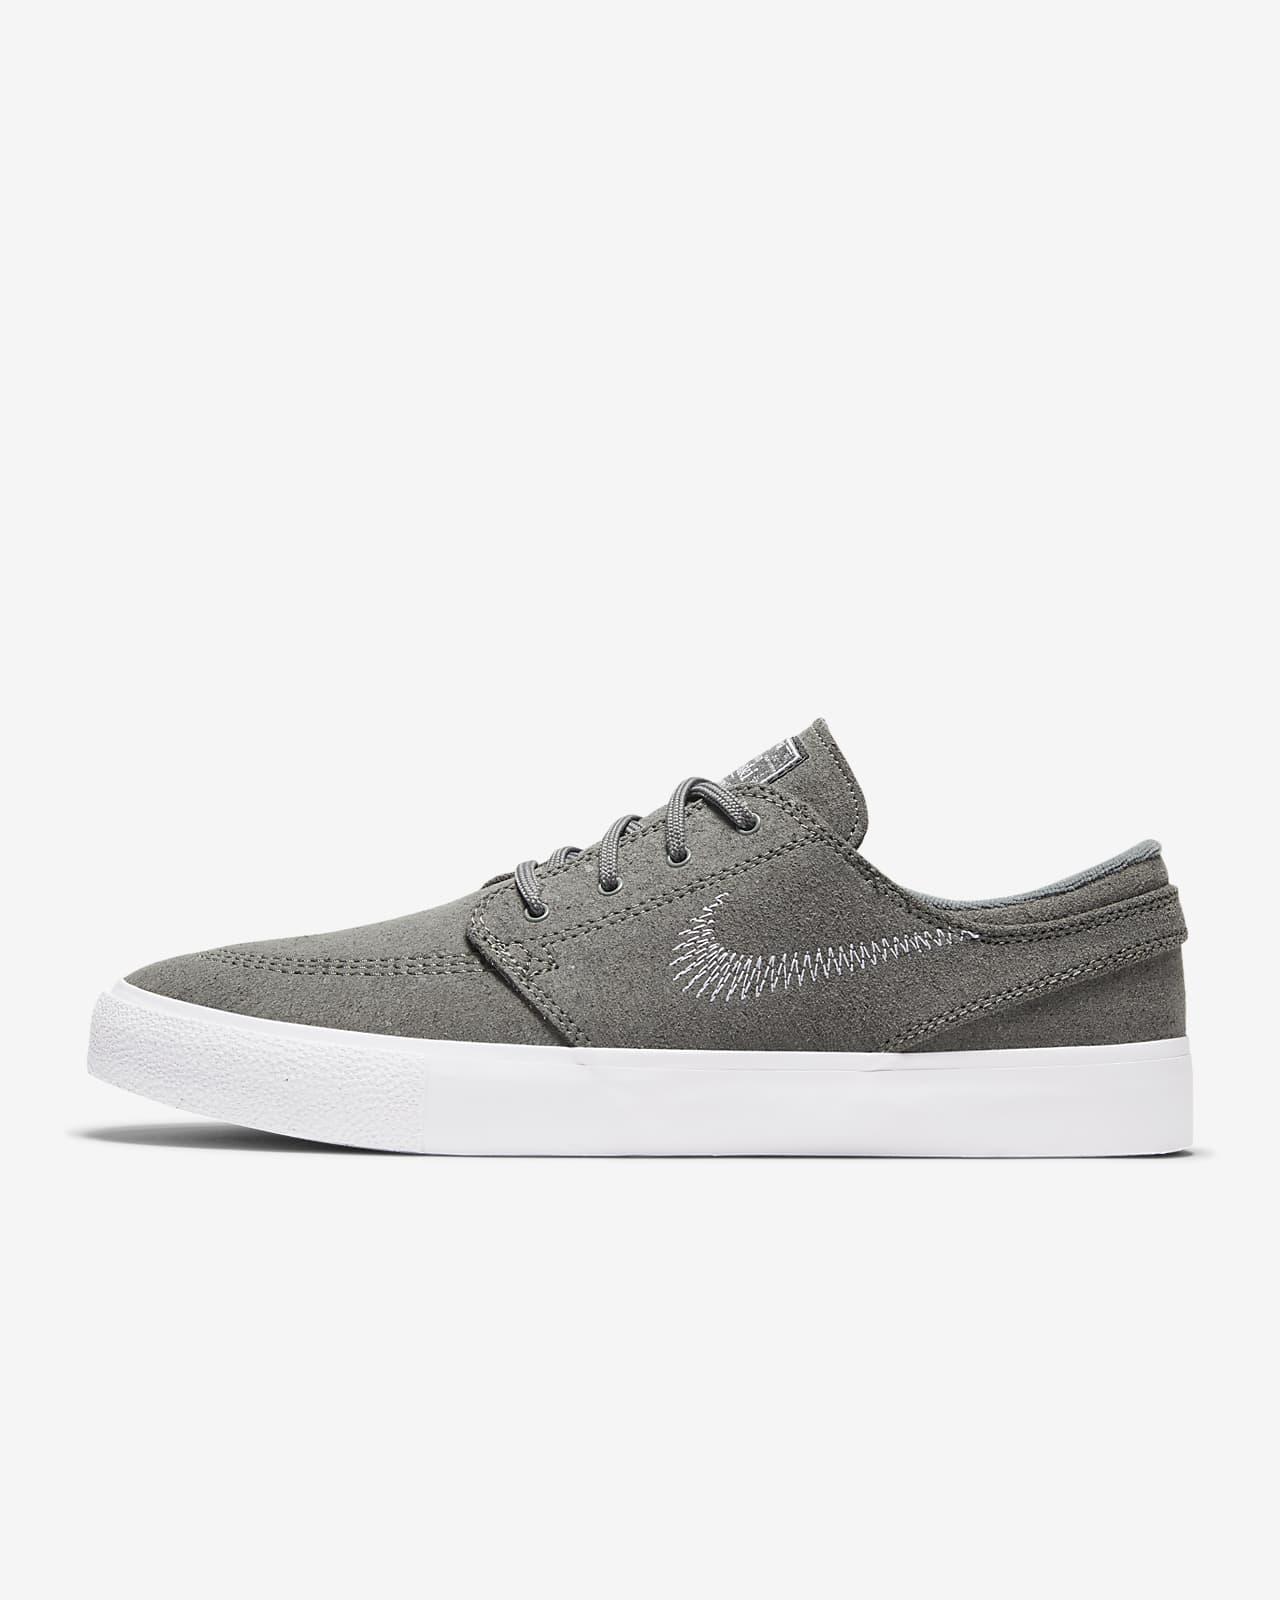 Calzado de skateboarding Nike SB Zoom Stefan Janoski FL RM